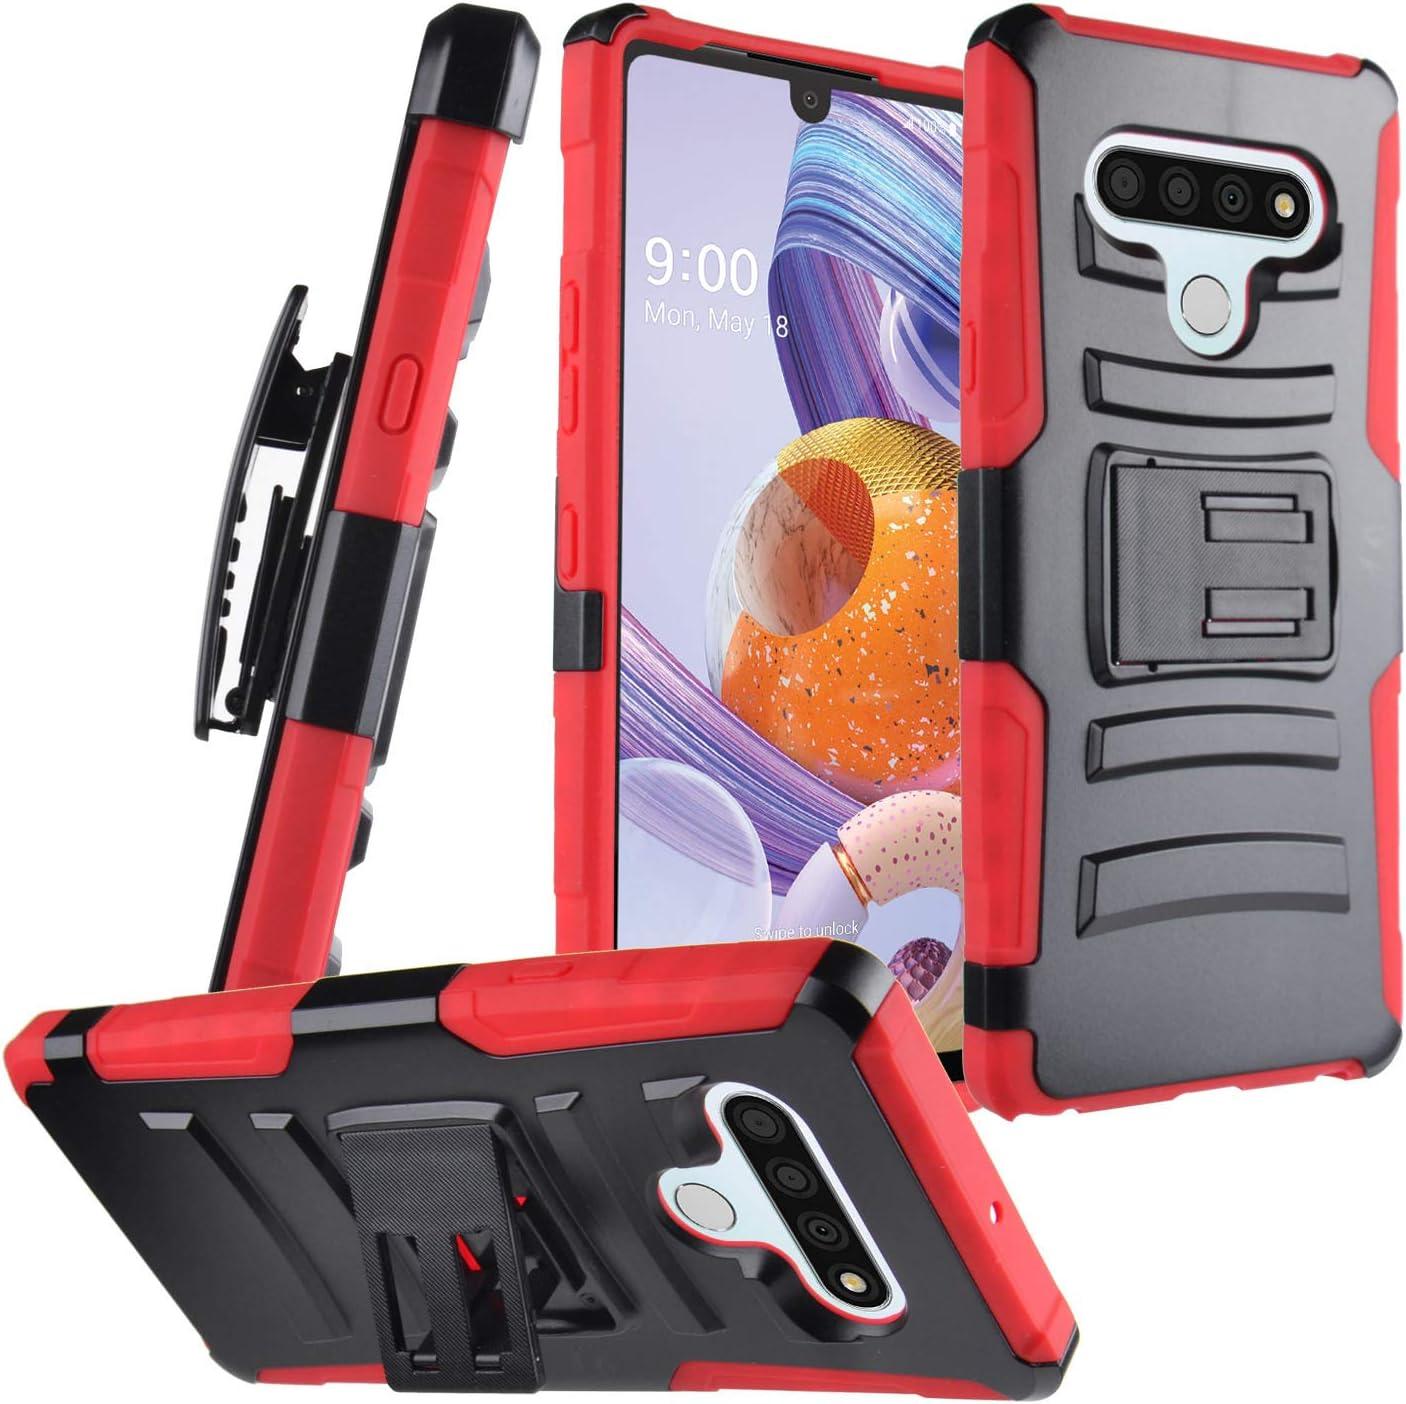 CELZEN - for LG Stylo 6 LM-Q730 (2020) - Hybrid Phone Case w/Stand/Belt Clip Holster - CV1 Red